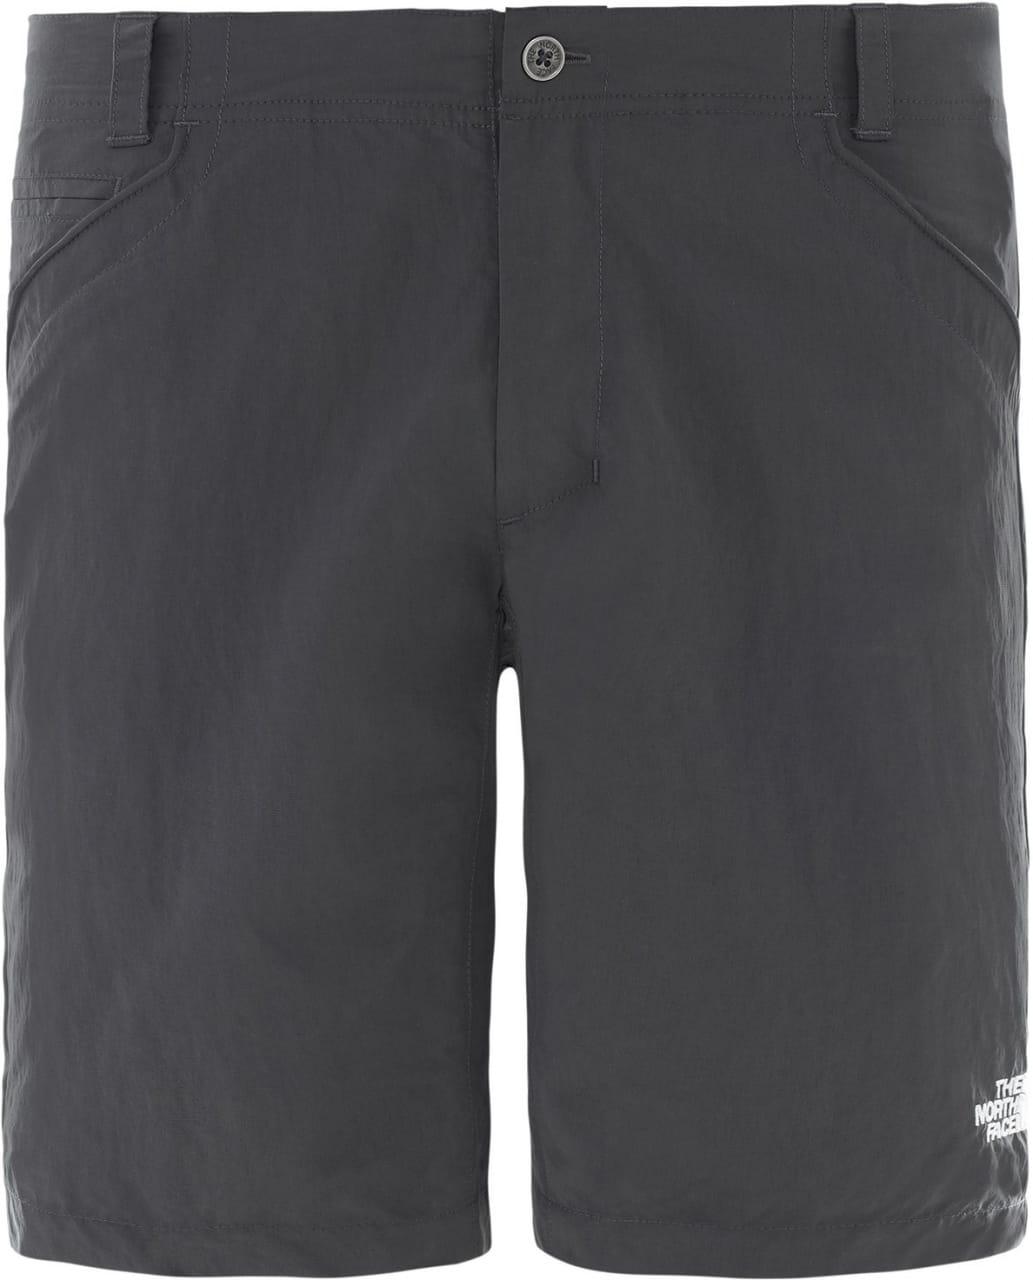 Shorts The North Face Men's Anticline Chino Shorts